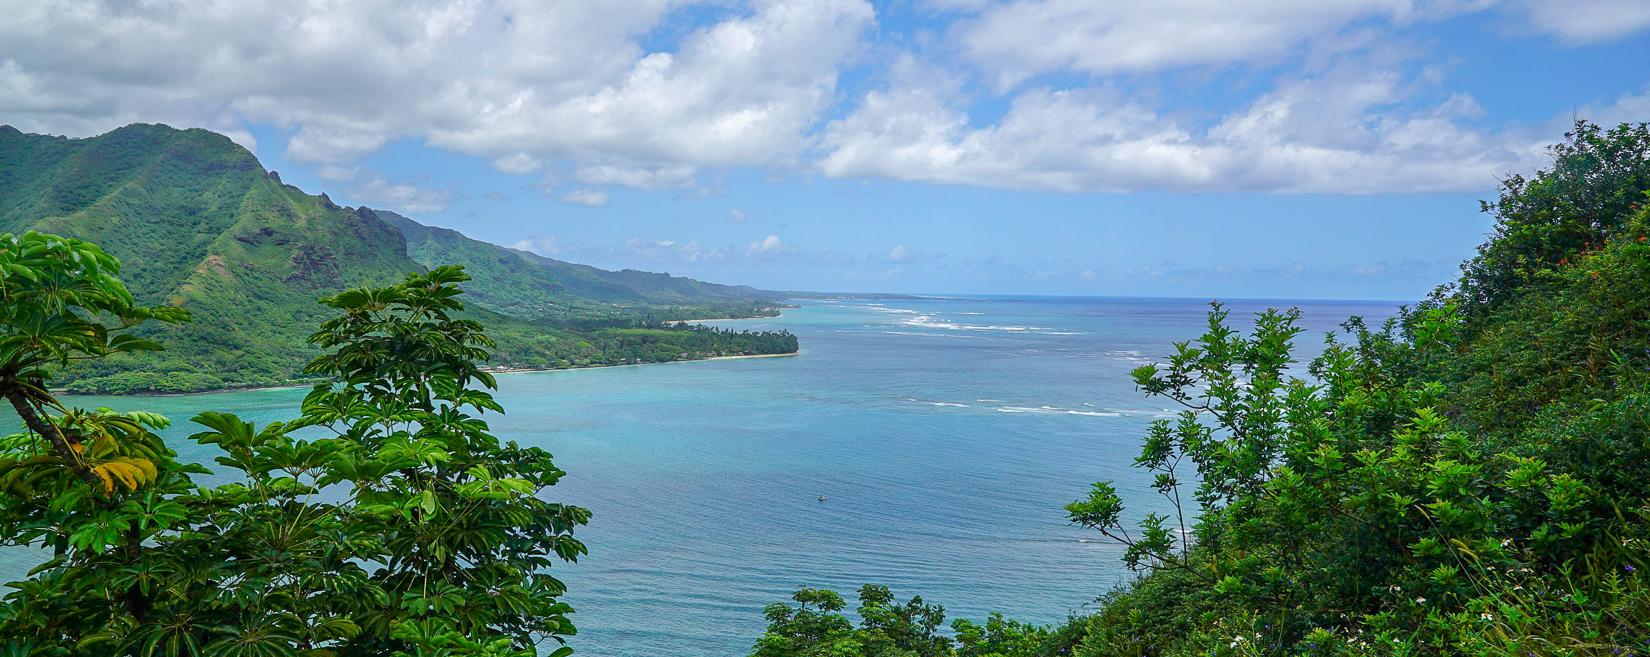 The Marine Conservation Biology Institute Phase II Program to Establish the Northwestern Hawaiin Islands National Marine Sanctuary